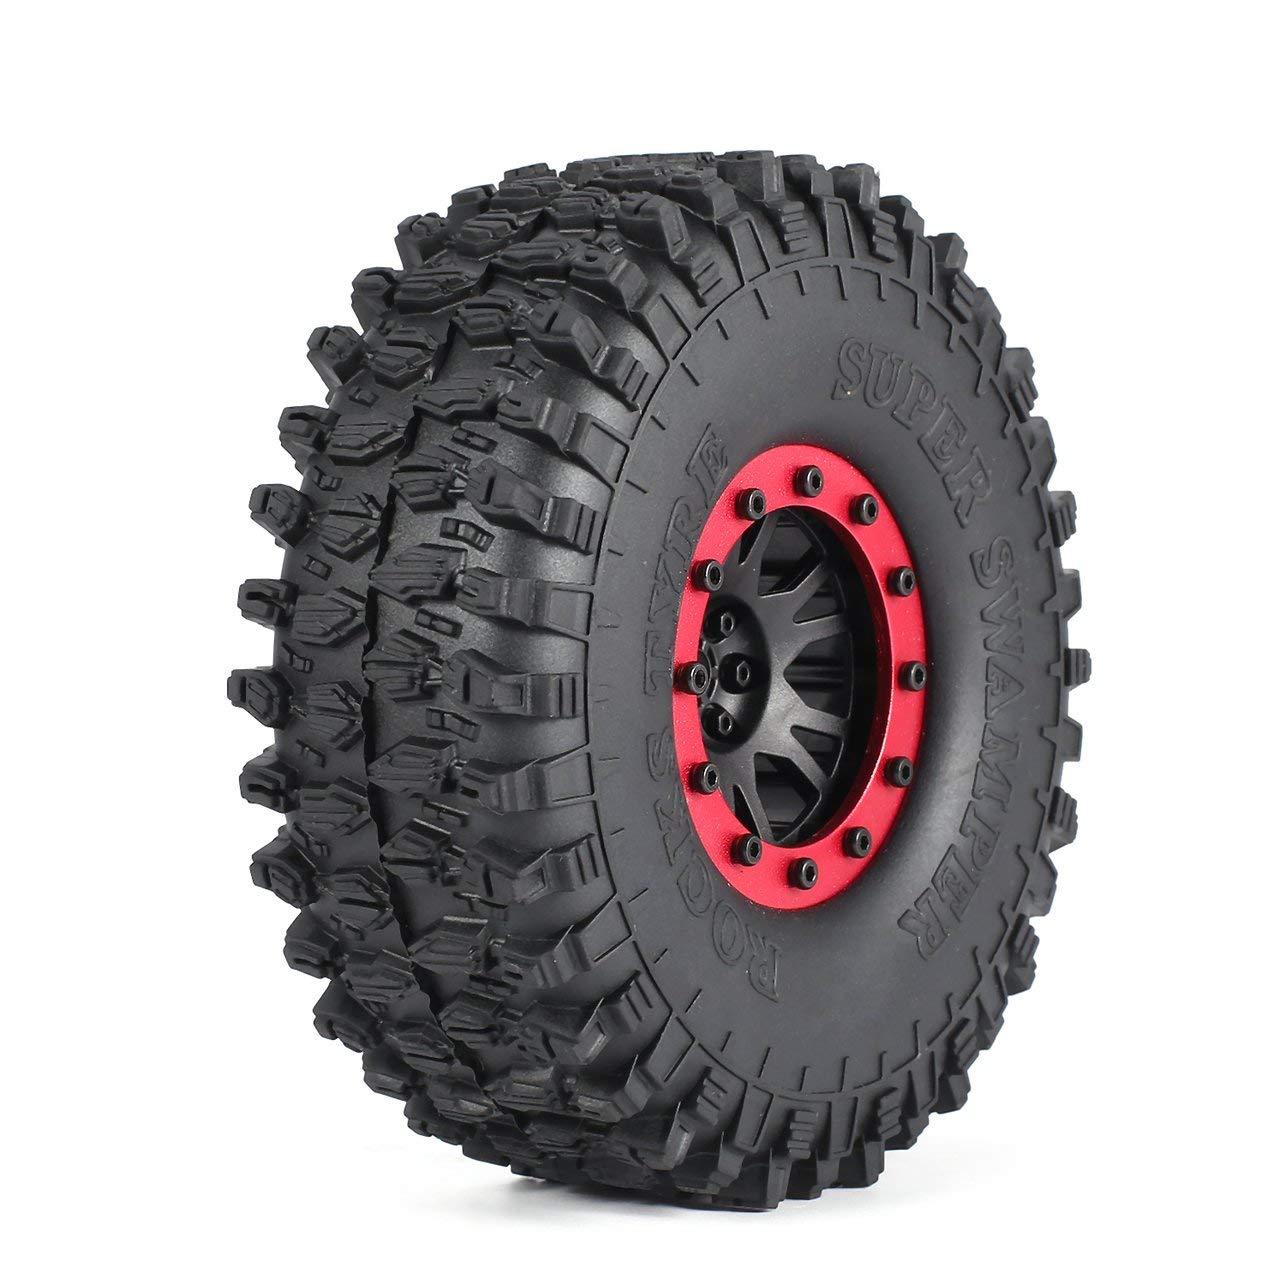 Color: rojo 4pcs AUSTAR 5020 120mm 1.9in Llanta Ruedas neum/áticos para 1//10 RC Crawler Car